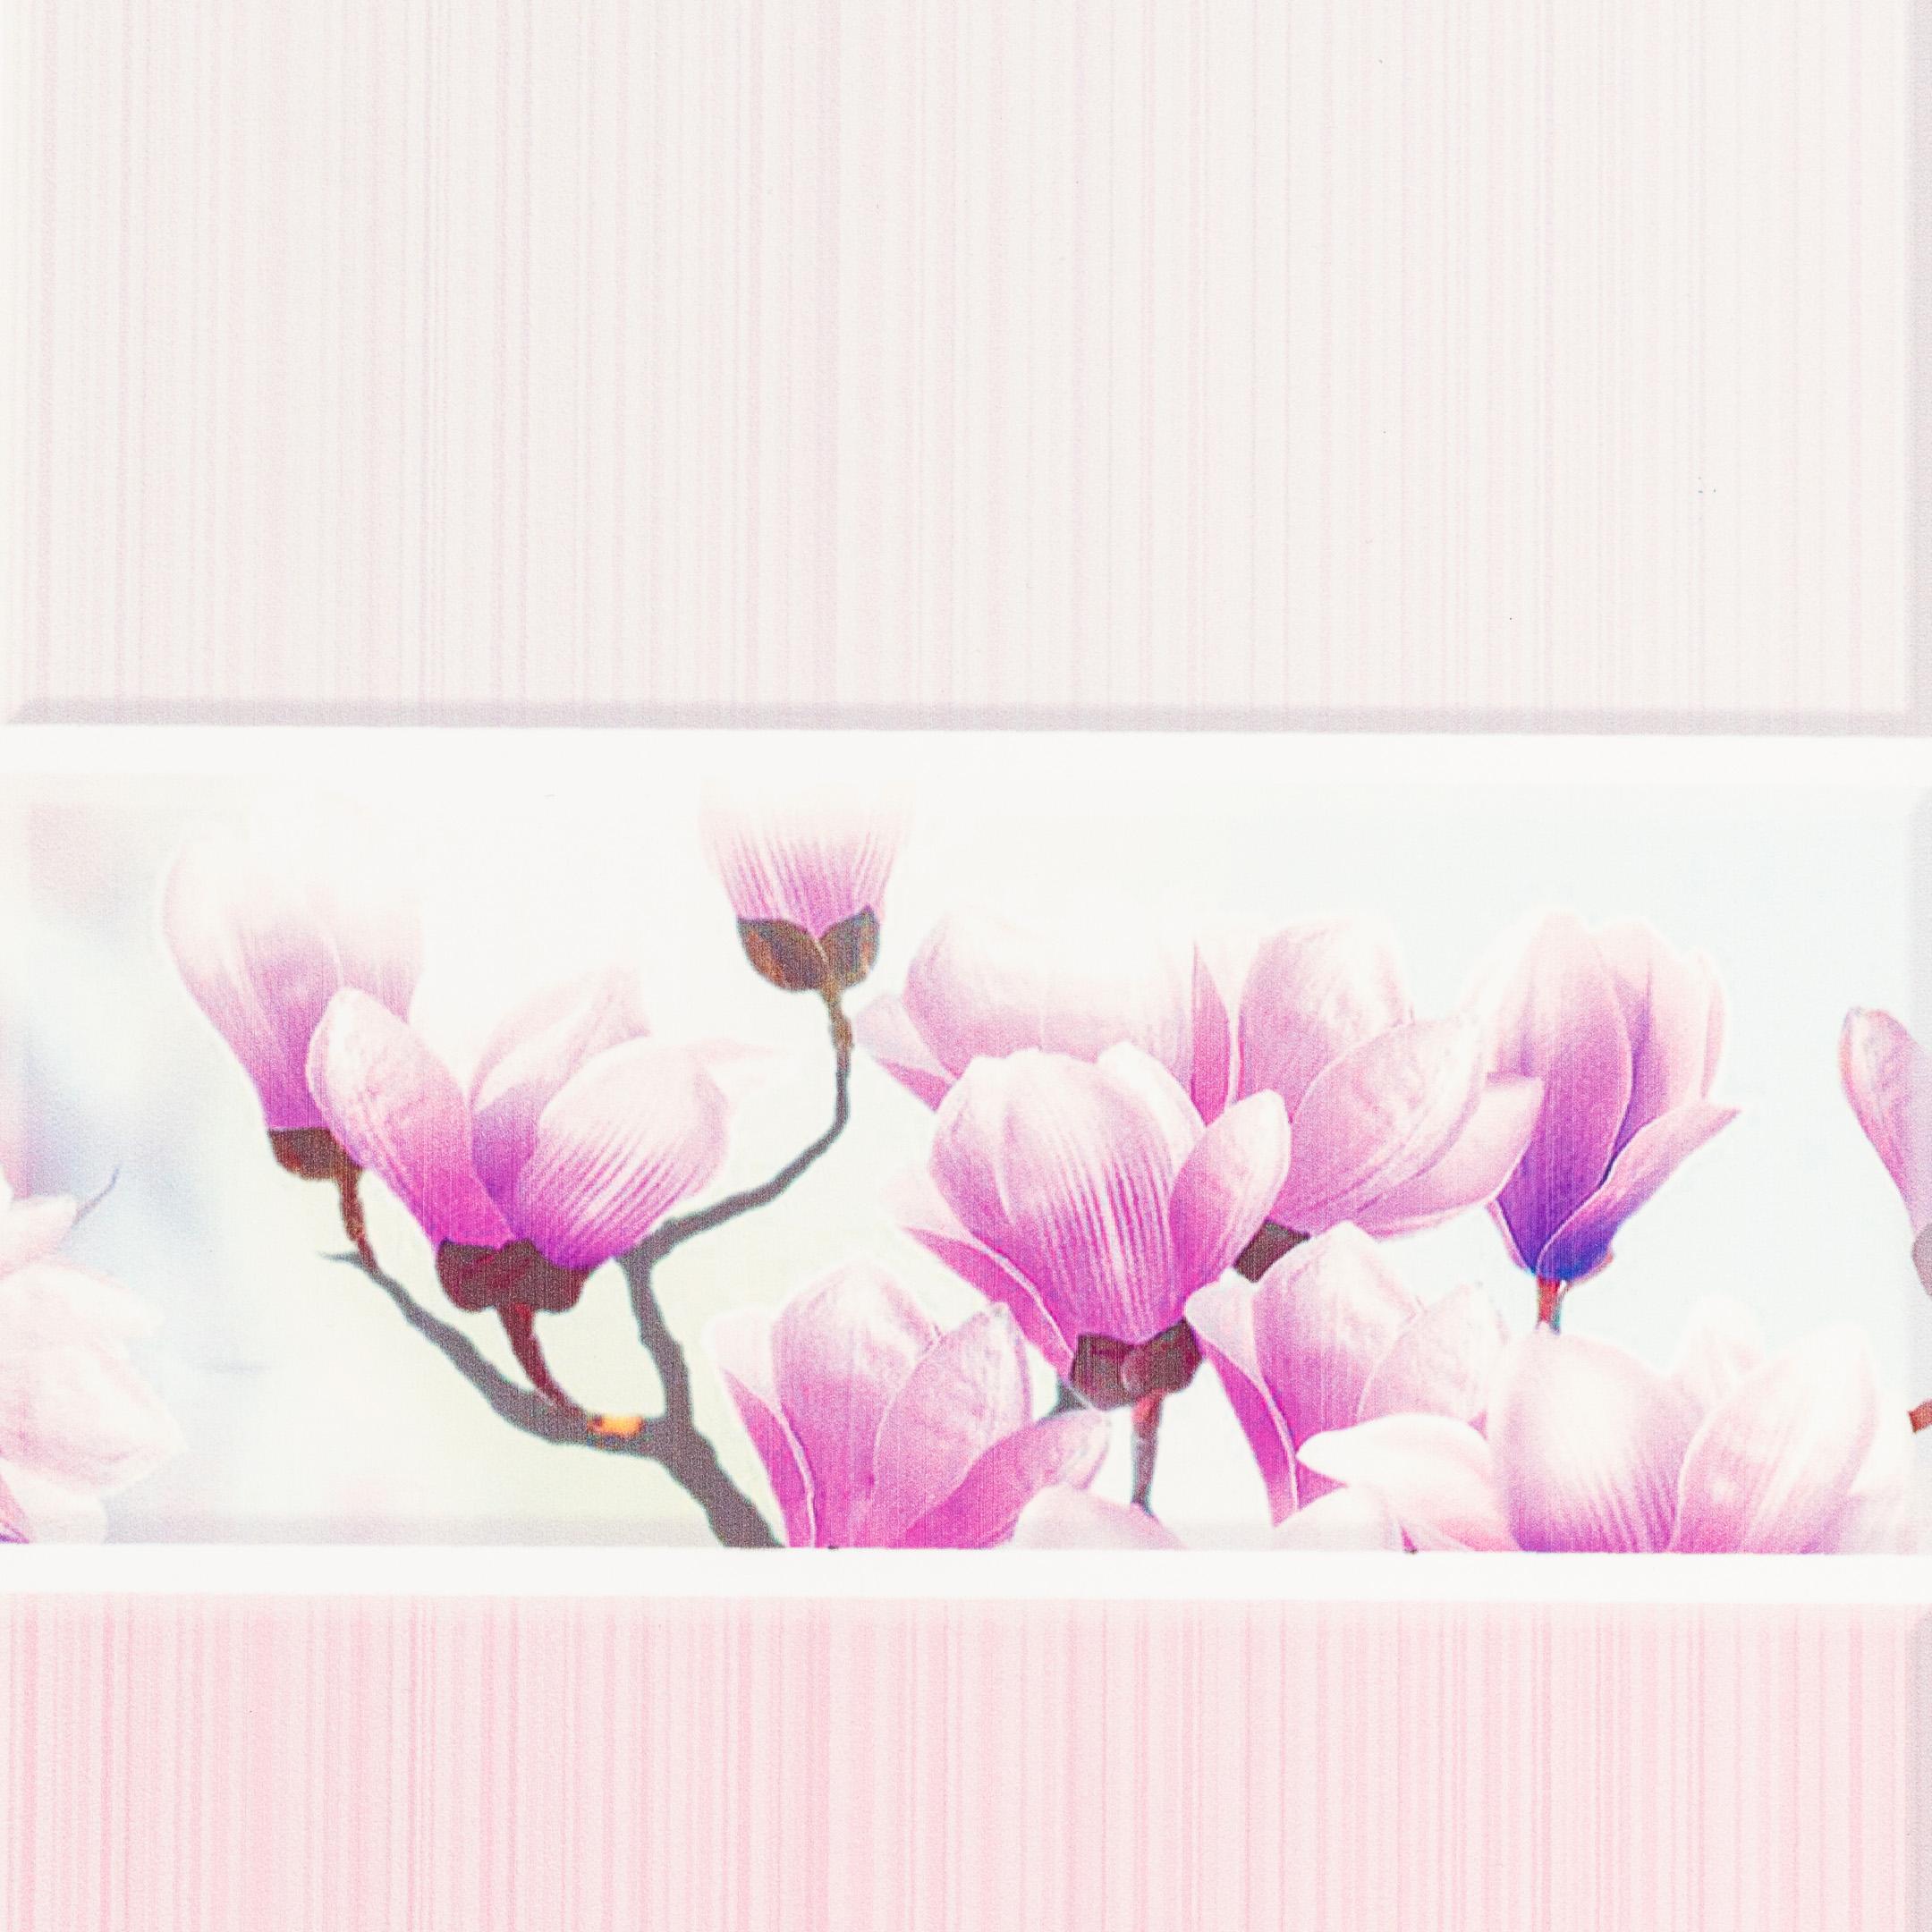 Панель ПВХ 250х2700х8 мм Центурион Blossom сакура фон.